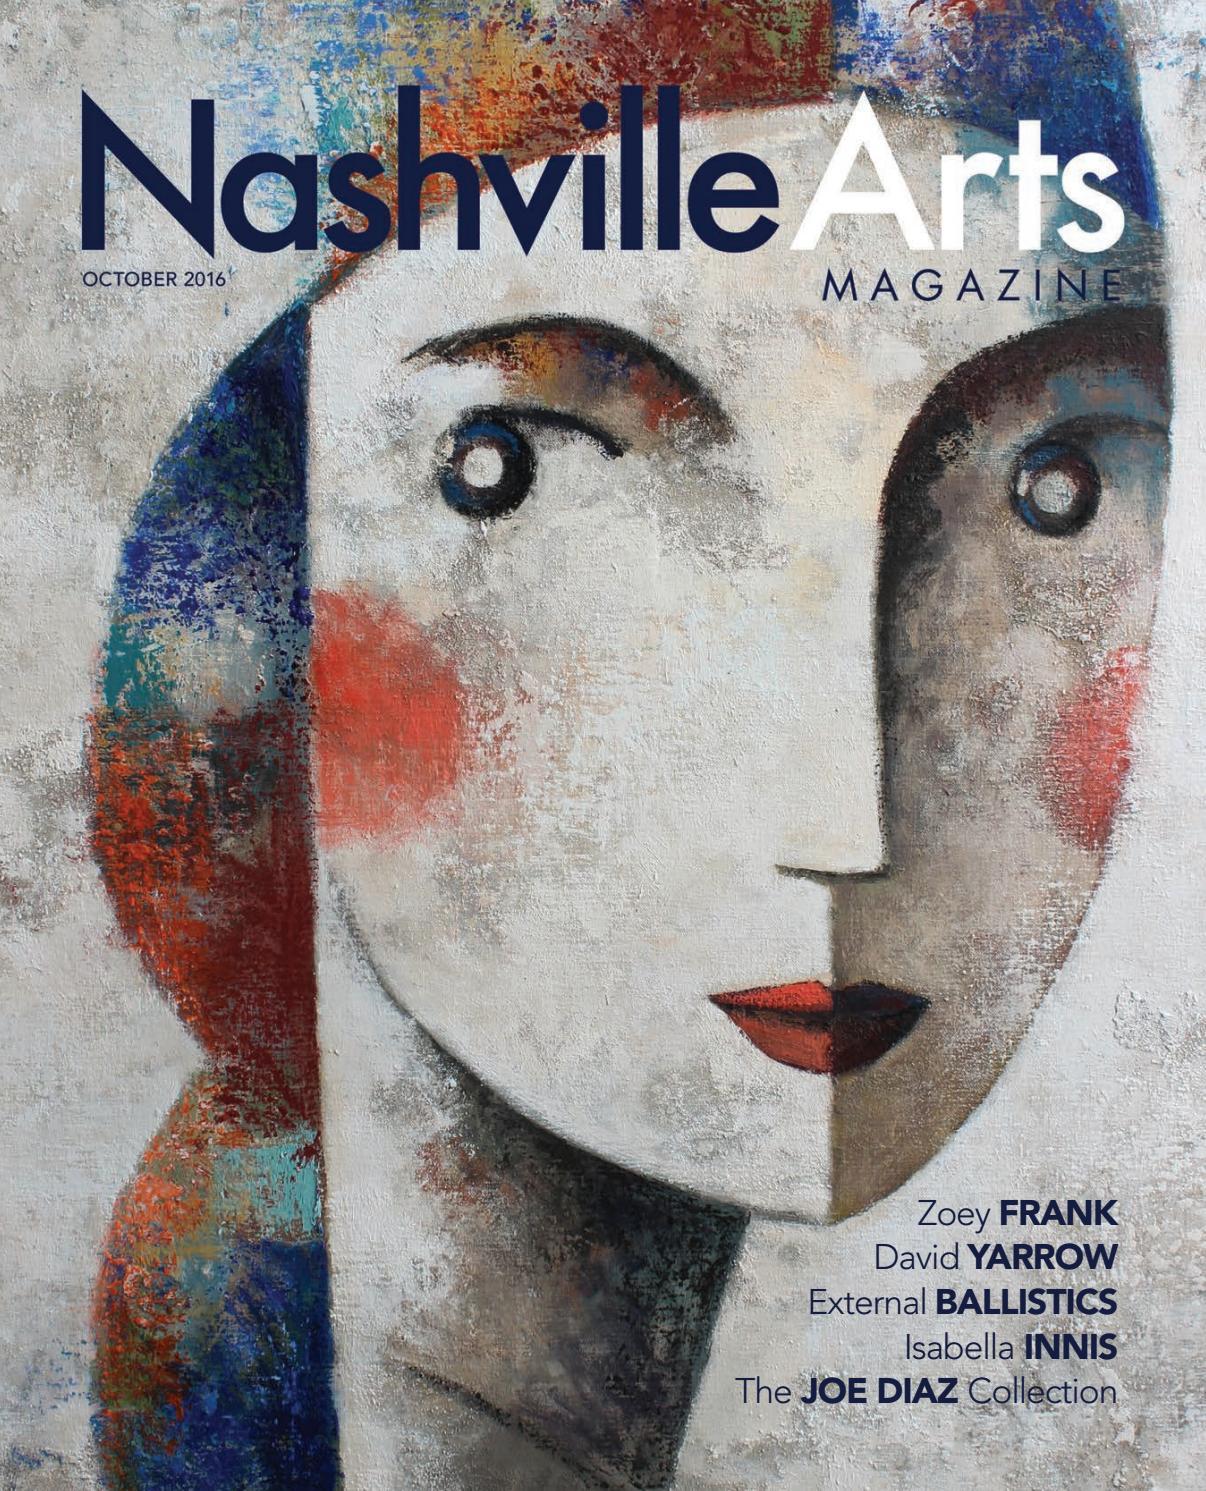 Nashville Arts Magazine - October 2016 by Nashville Arts Magazine - issuu 4bcfbfef1